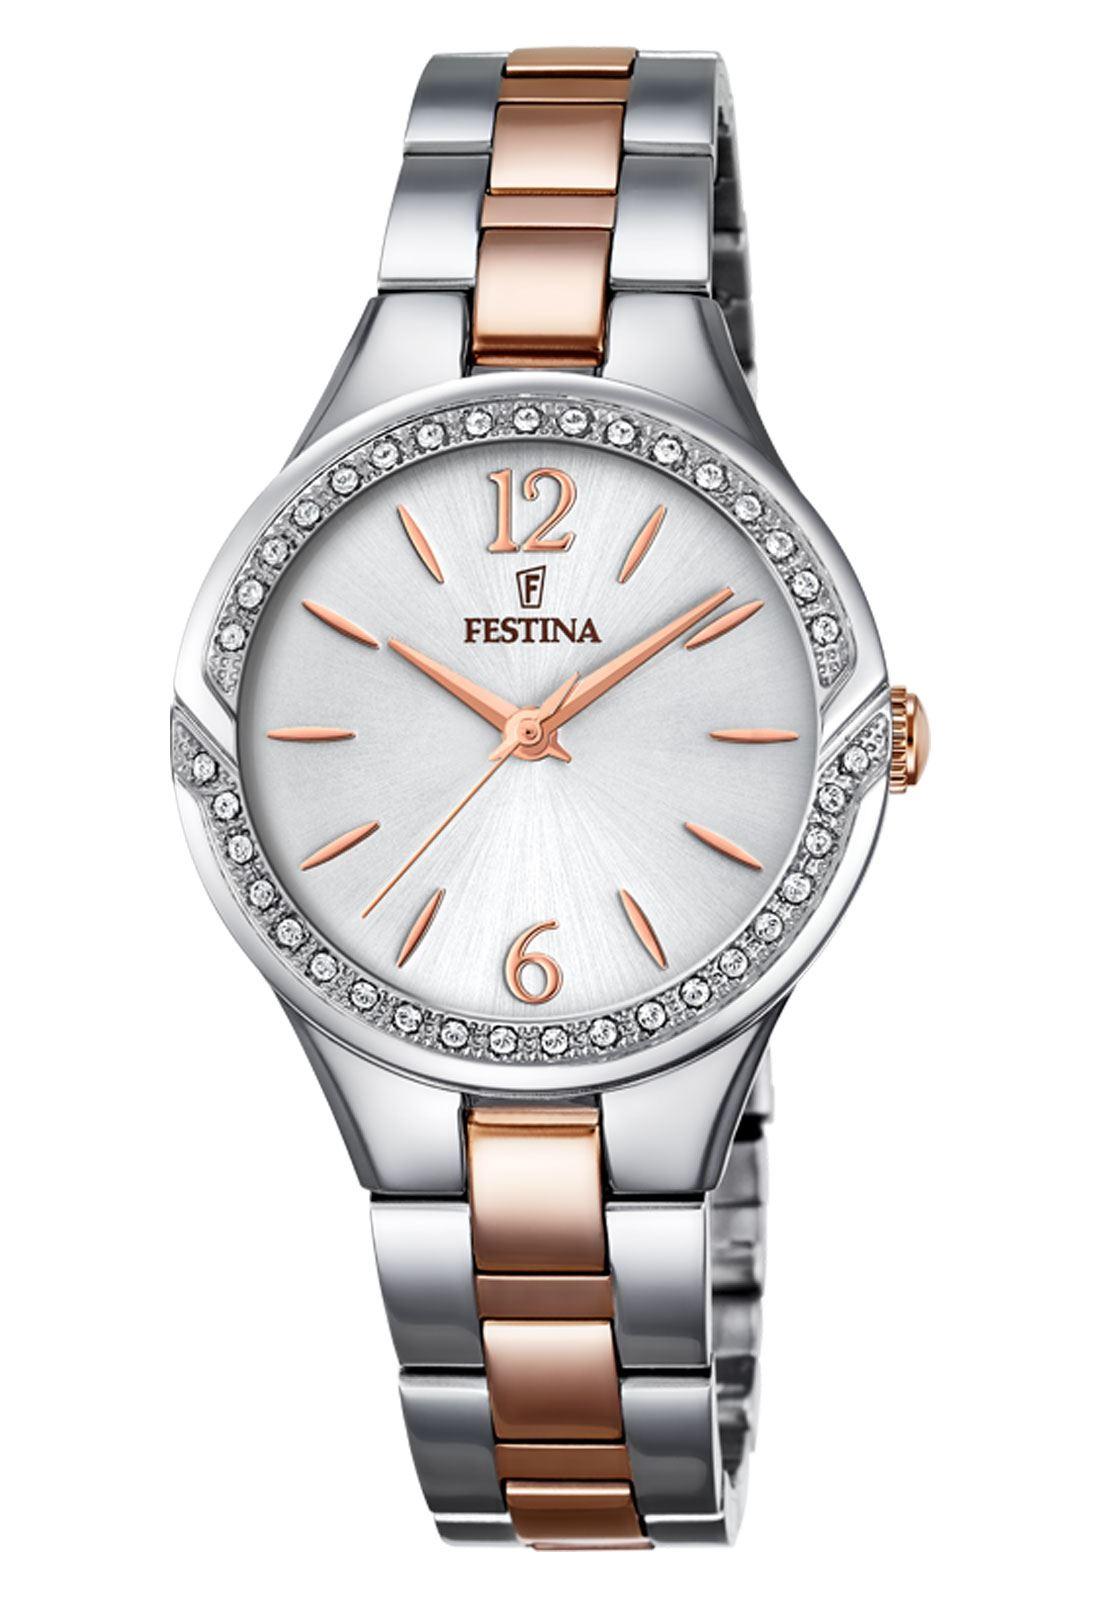 29316e65e7b7 Reloj F20247 1 Plateado Festina Mujer Mademoiselle